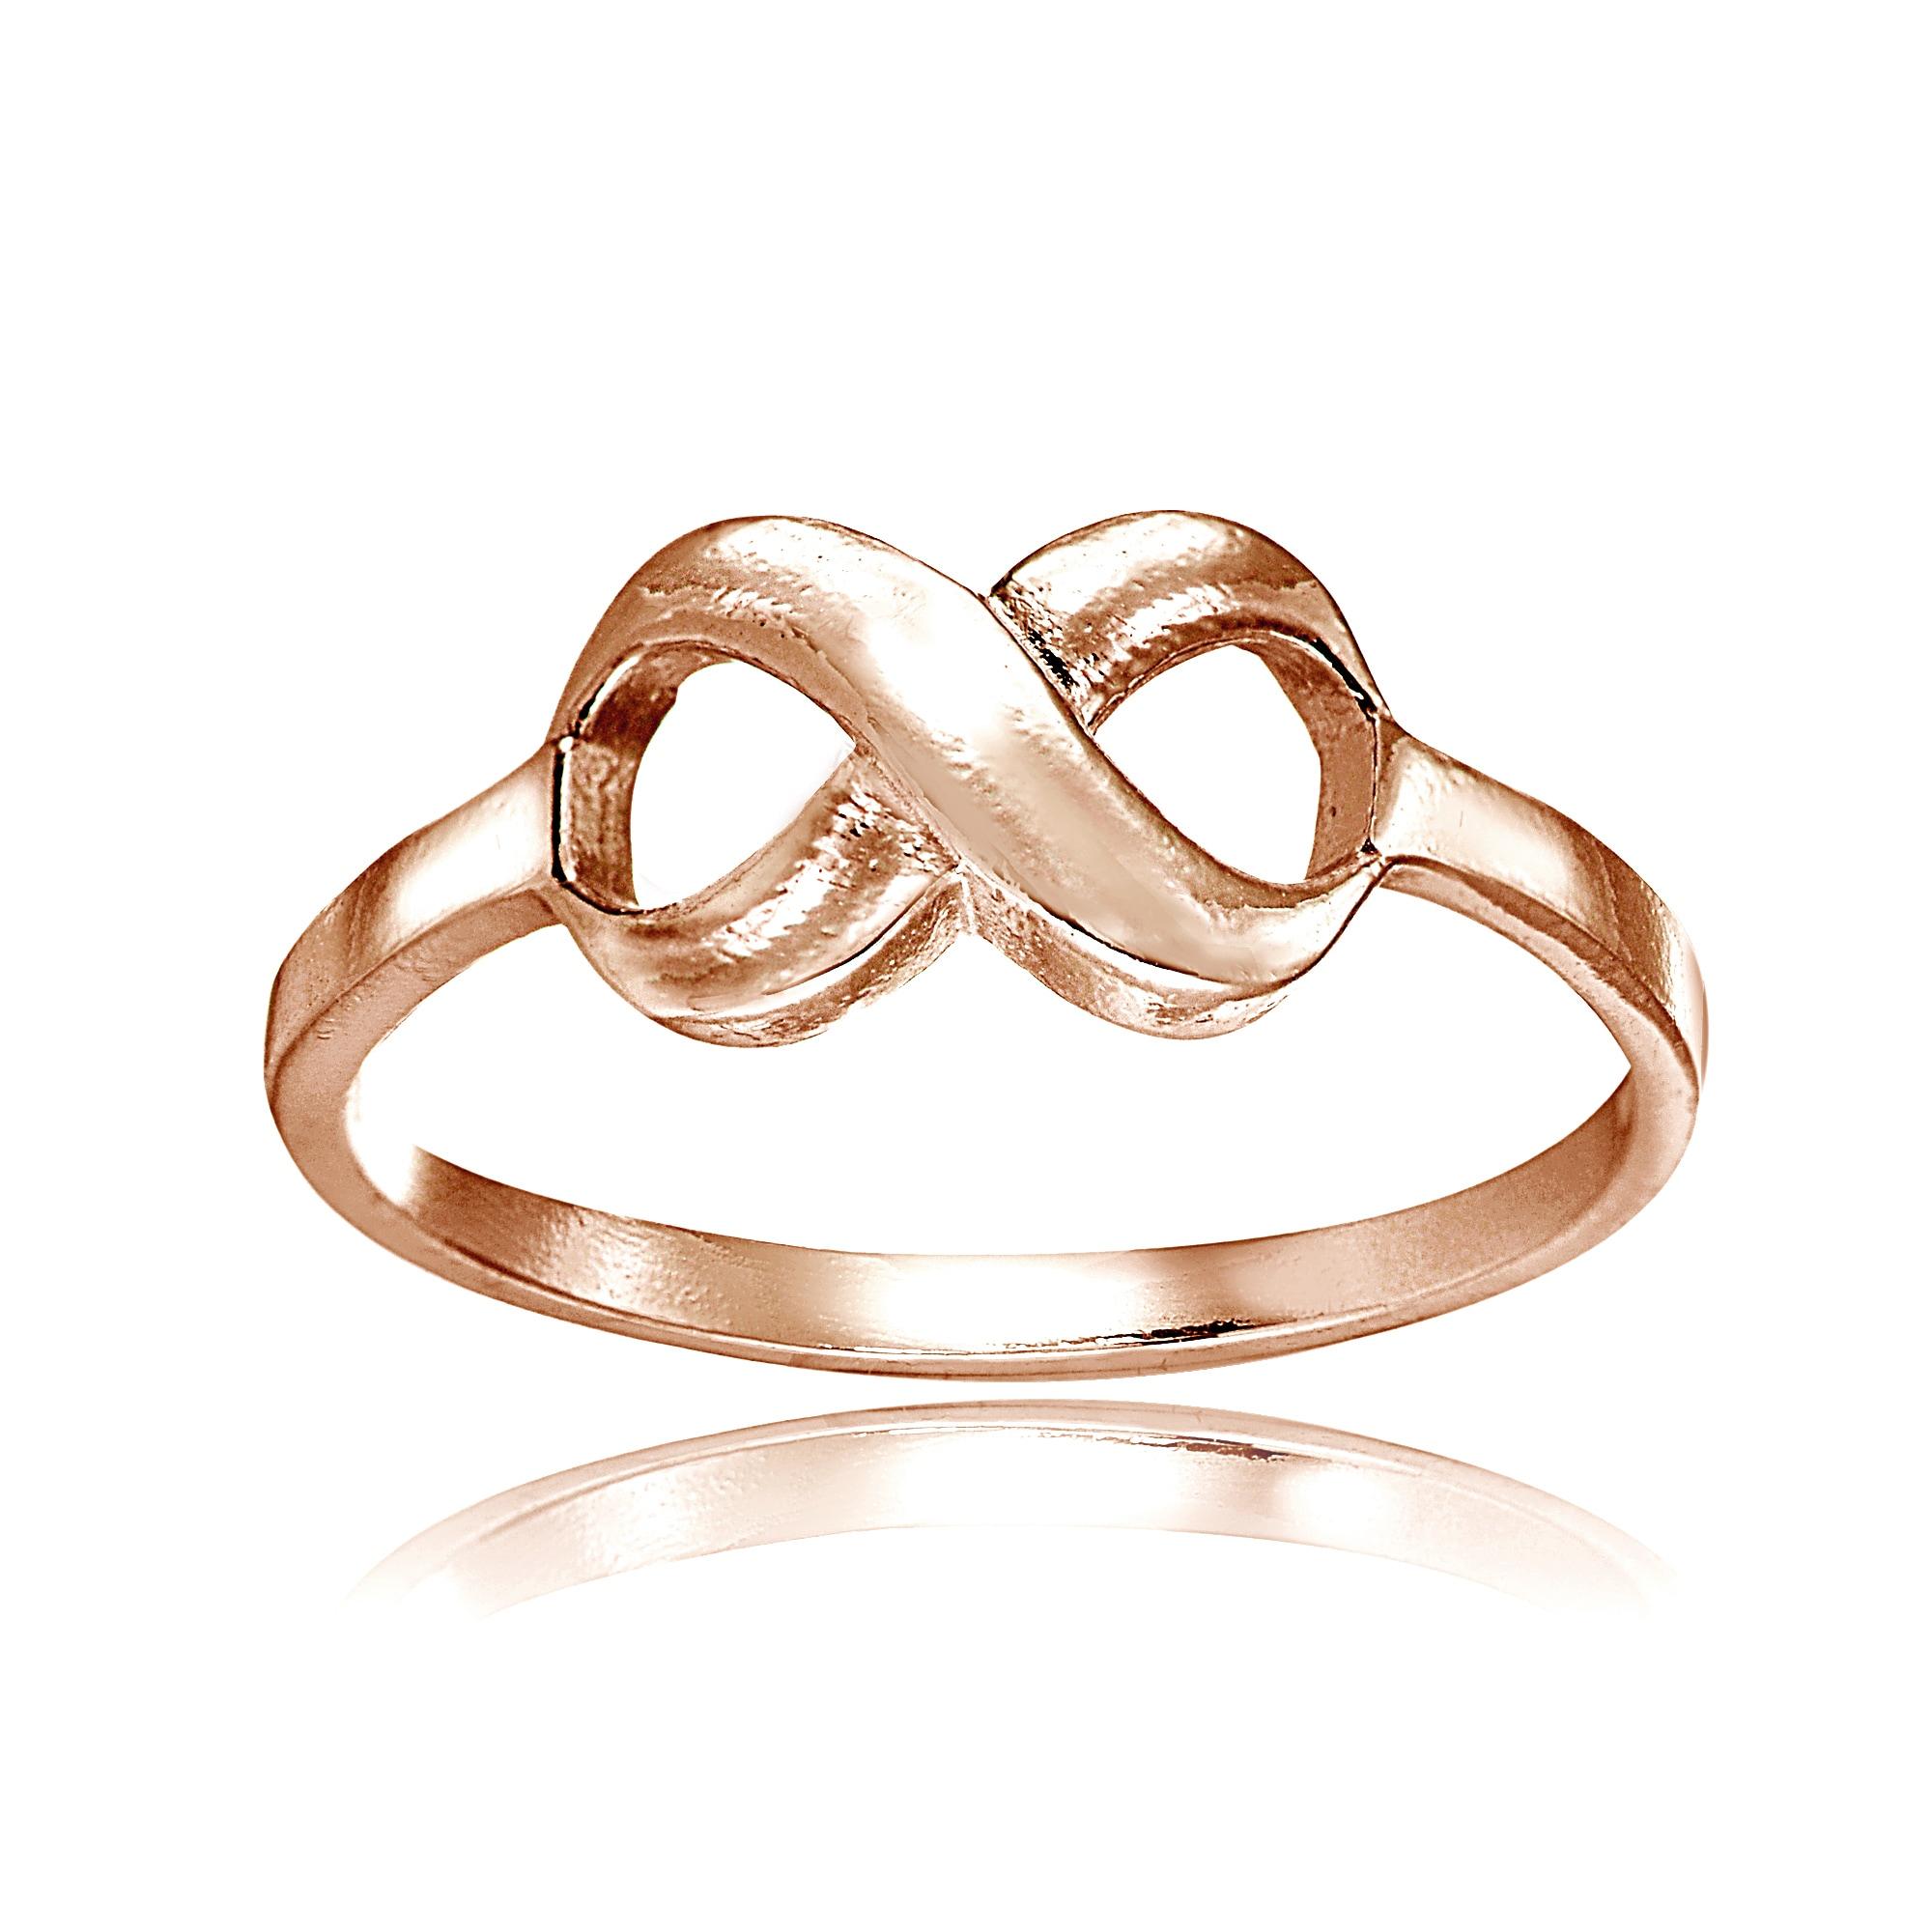 Mondevio 18k Rose Gold Over Sterling Silver High Polished...